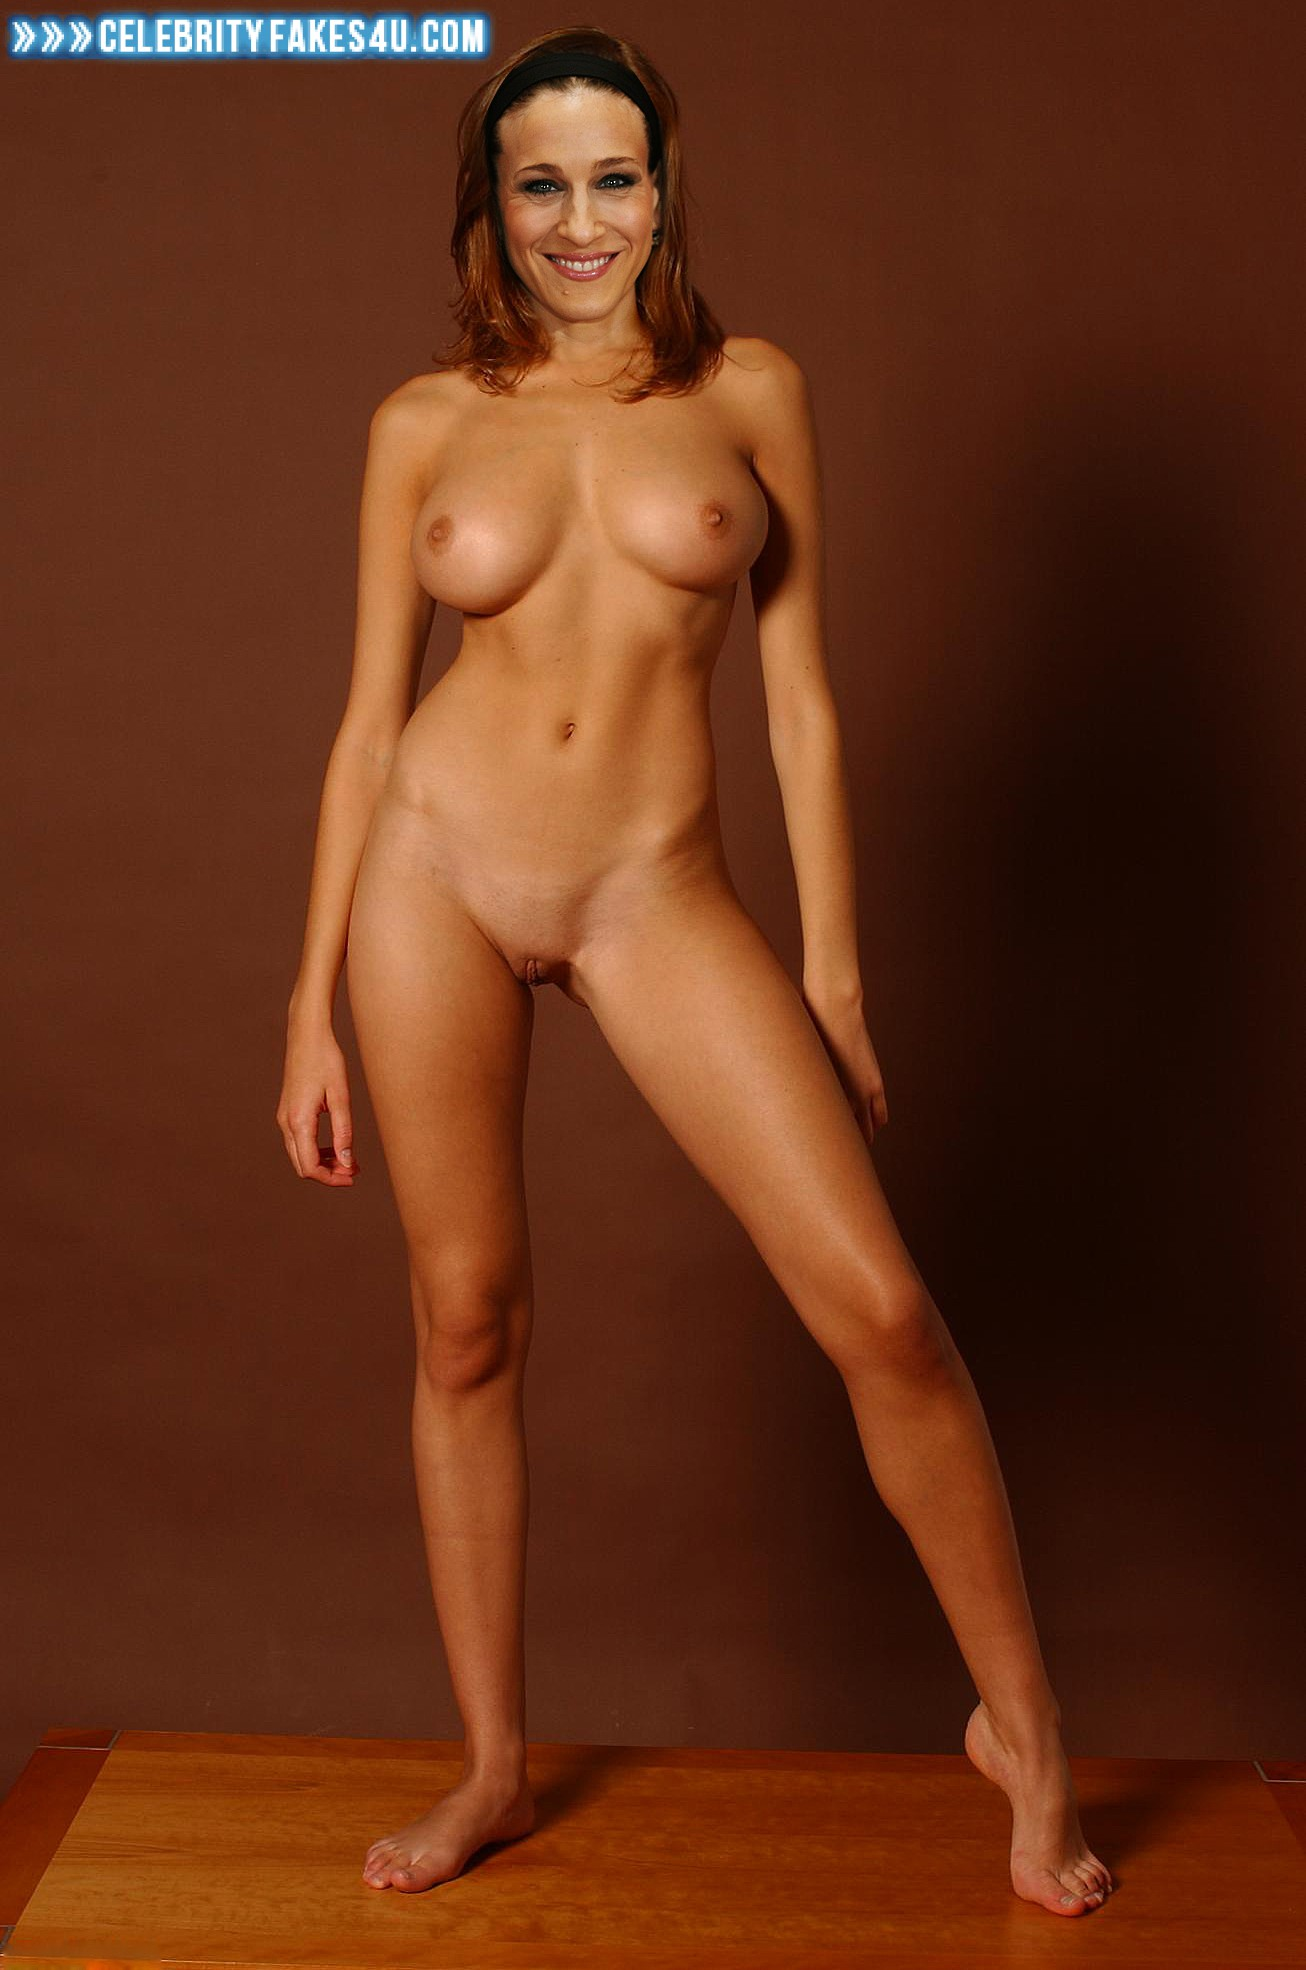 Hot naked model pic